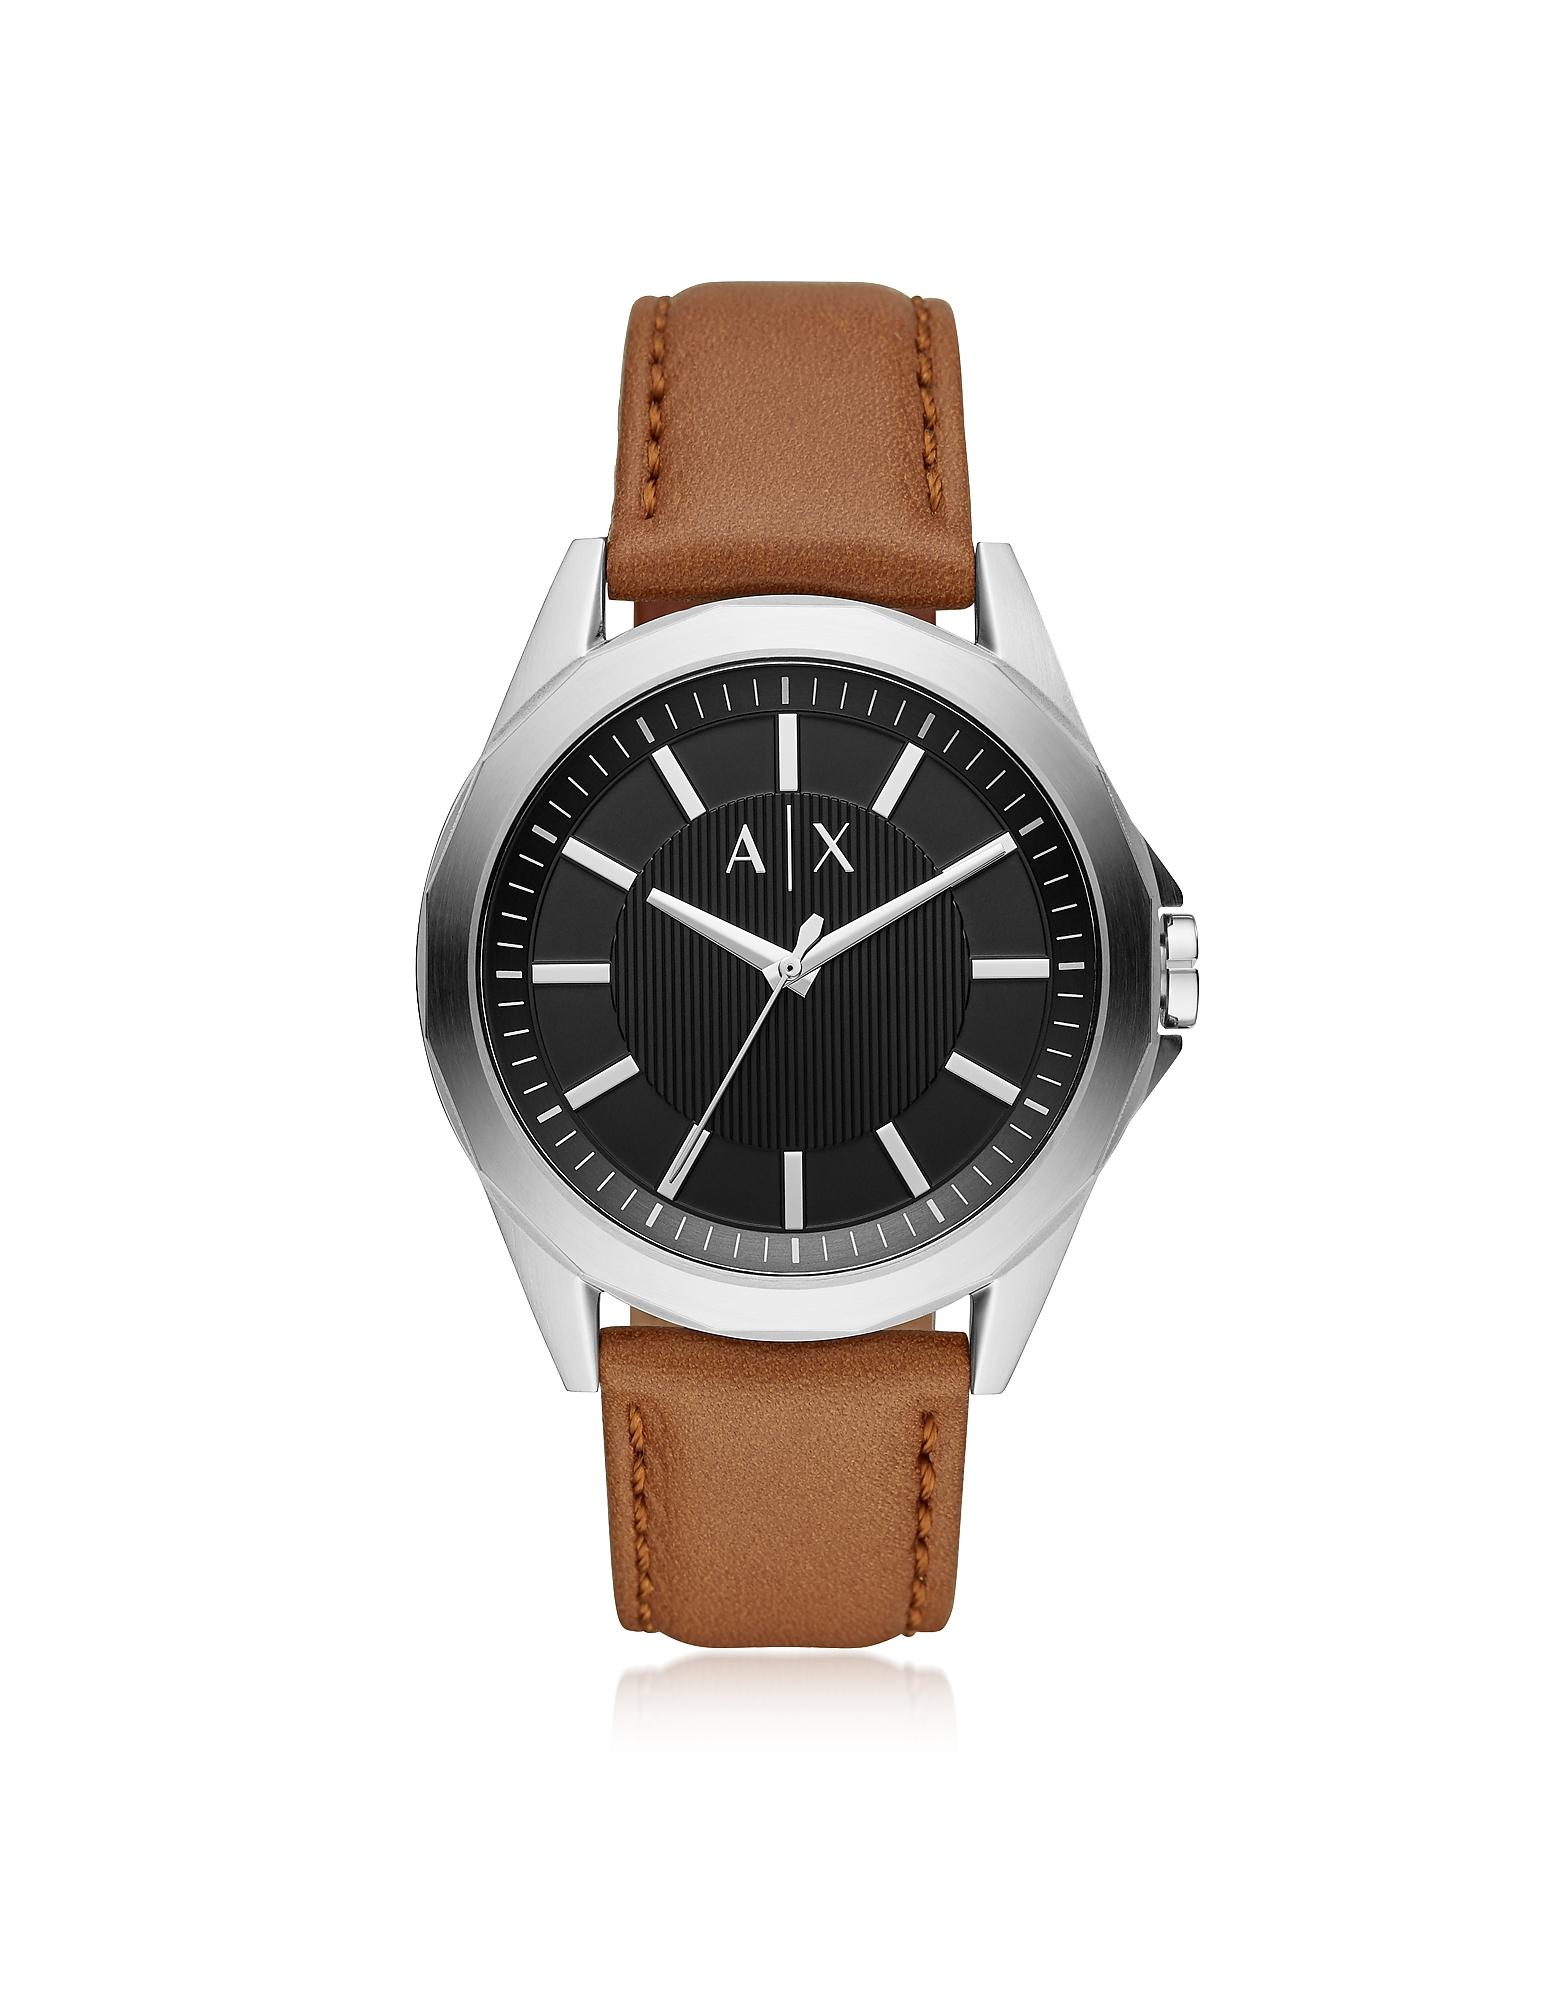 Drexler Three-Hand Luggage Leather Watch